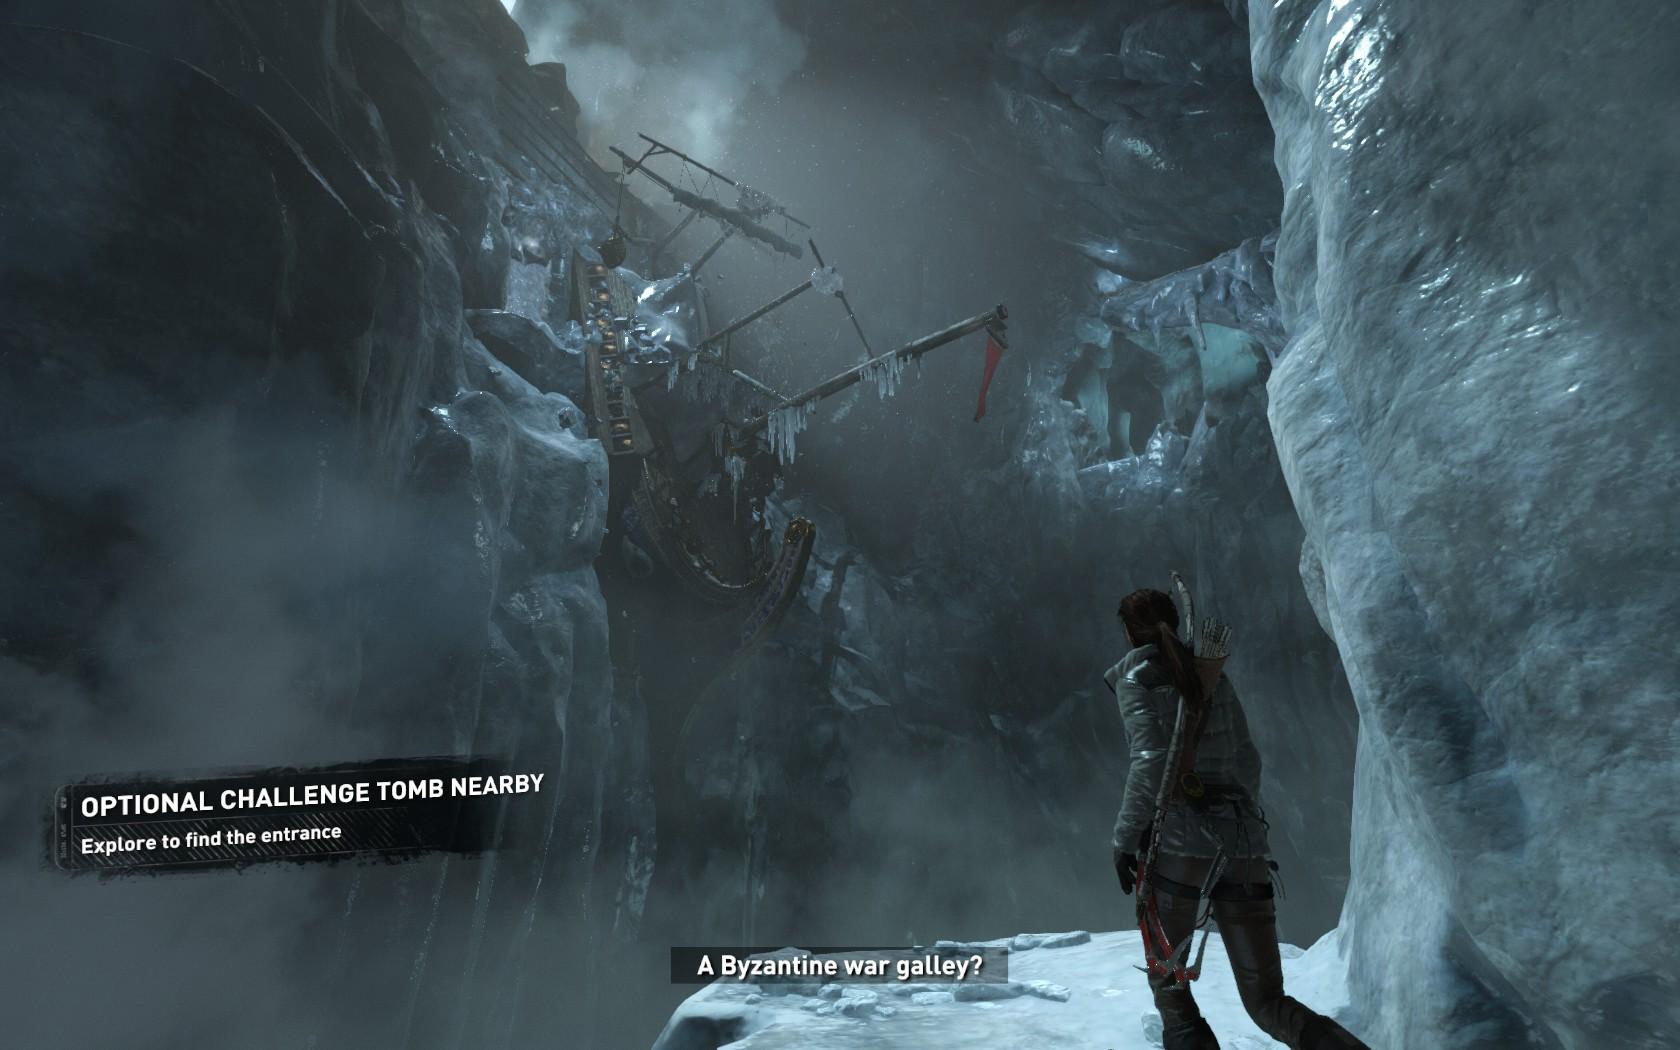 Rise of the Tomb Raider - PC verze pod drobnohledem 118486